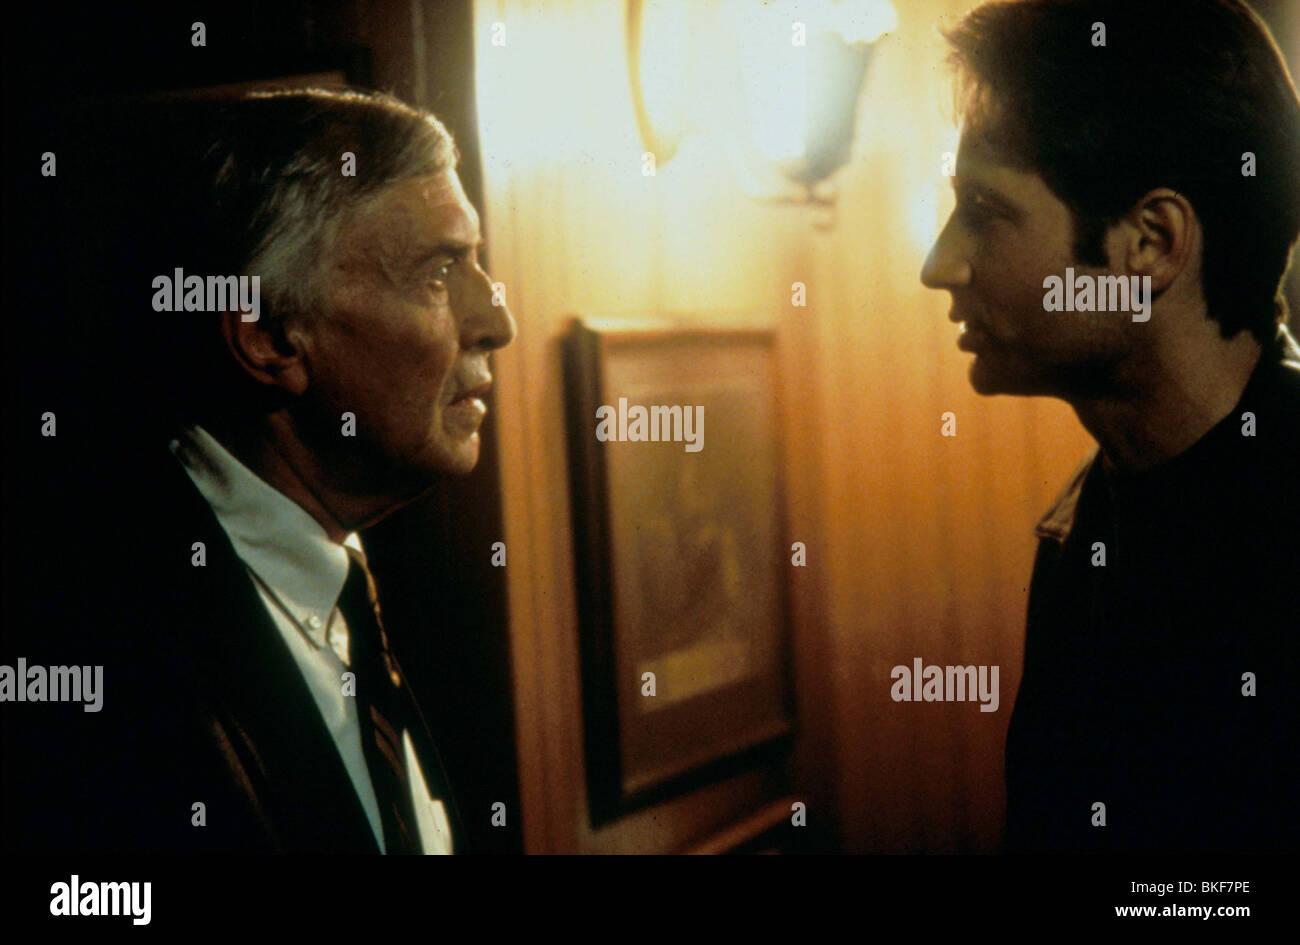 X-FILES: THE MOVIE (1998) MARTIN LANDAU, DAVID DUCHOVNY XFM 043 - Stock Image